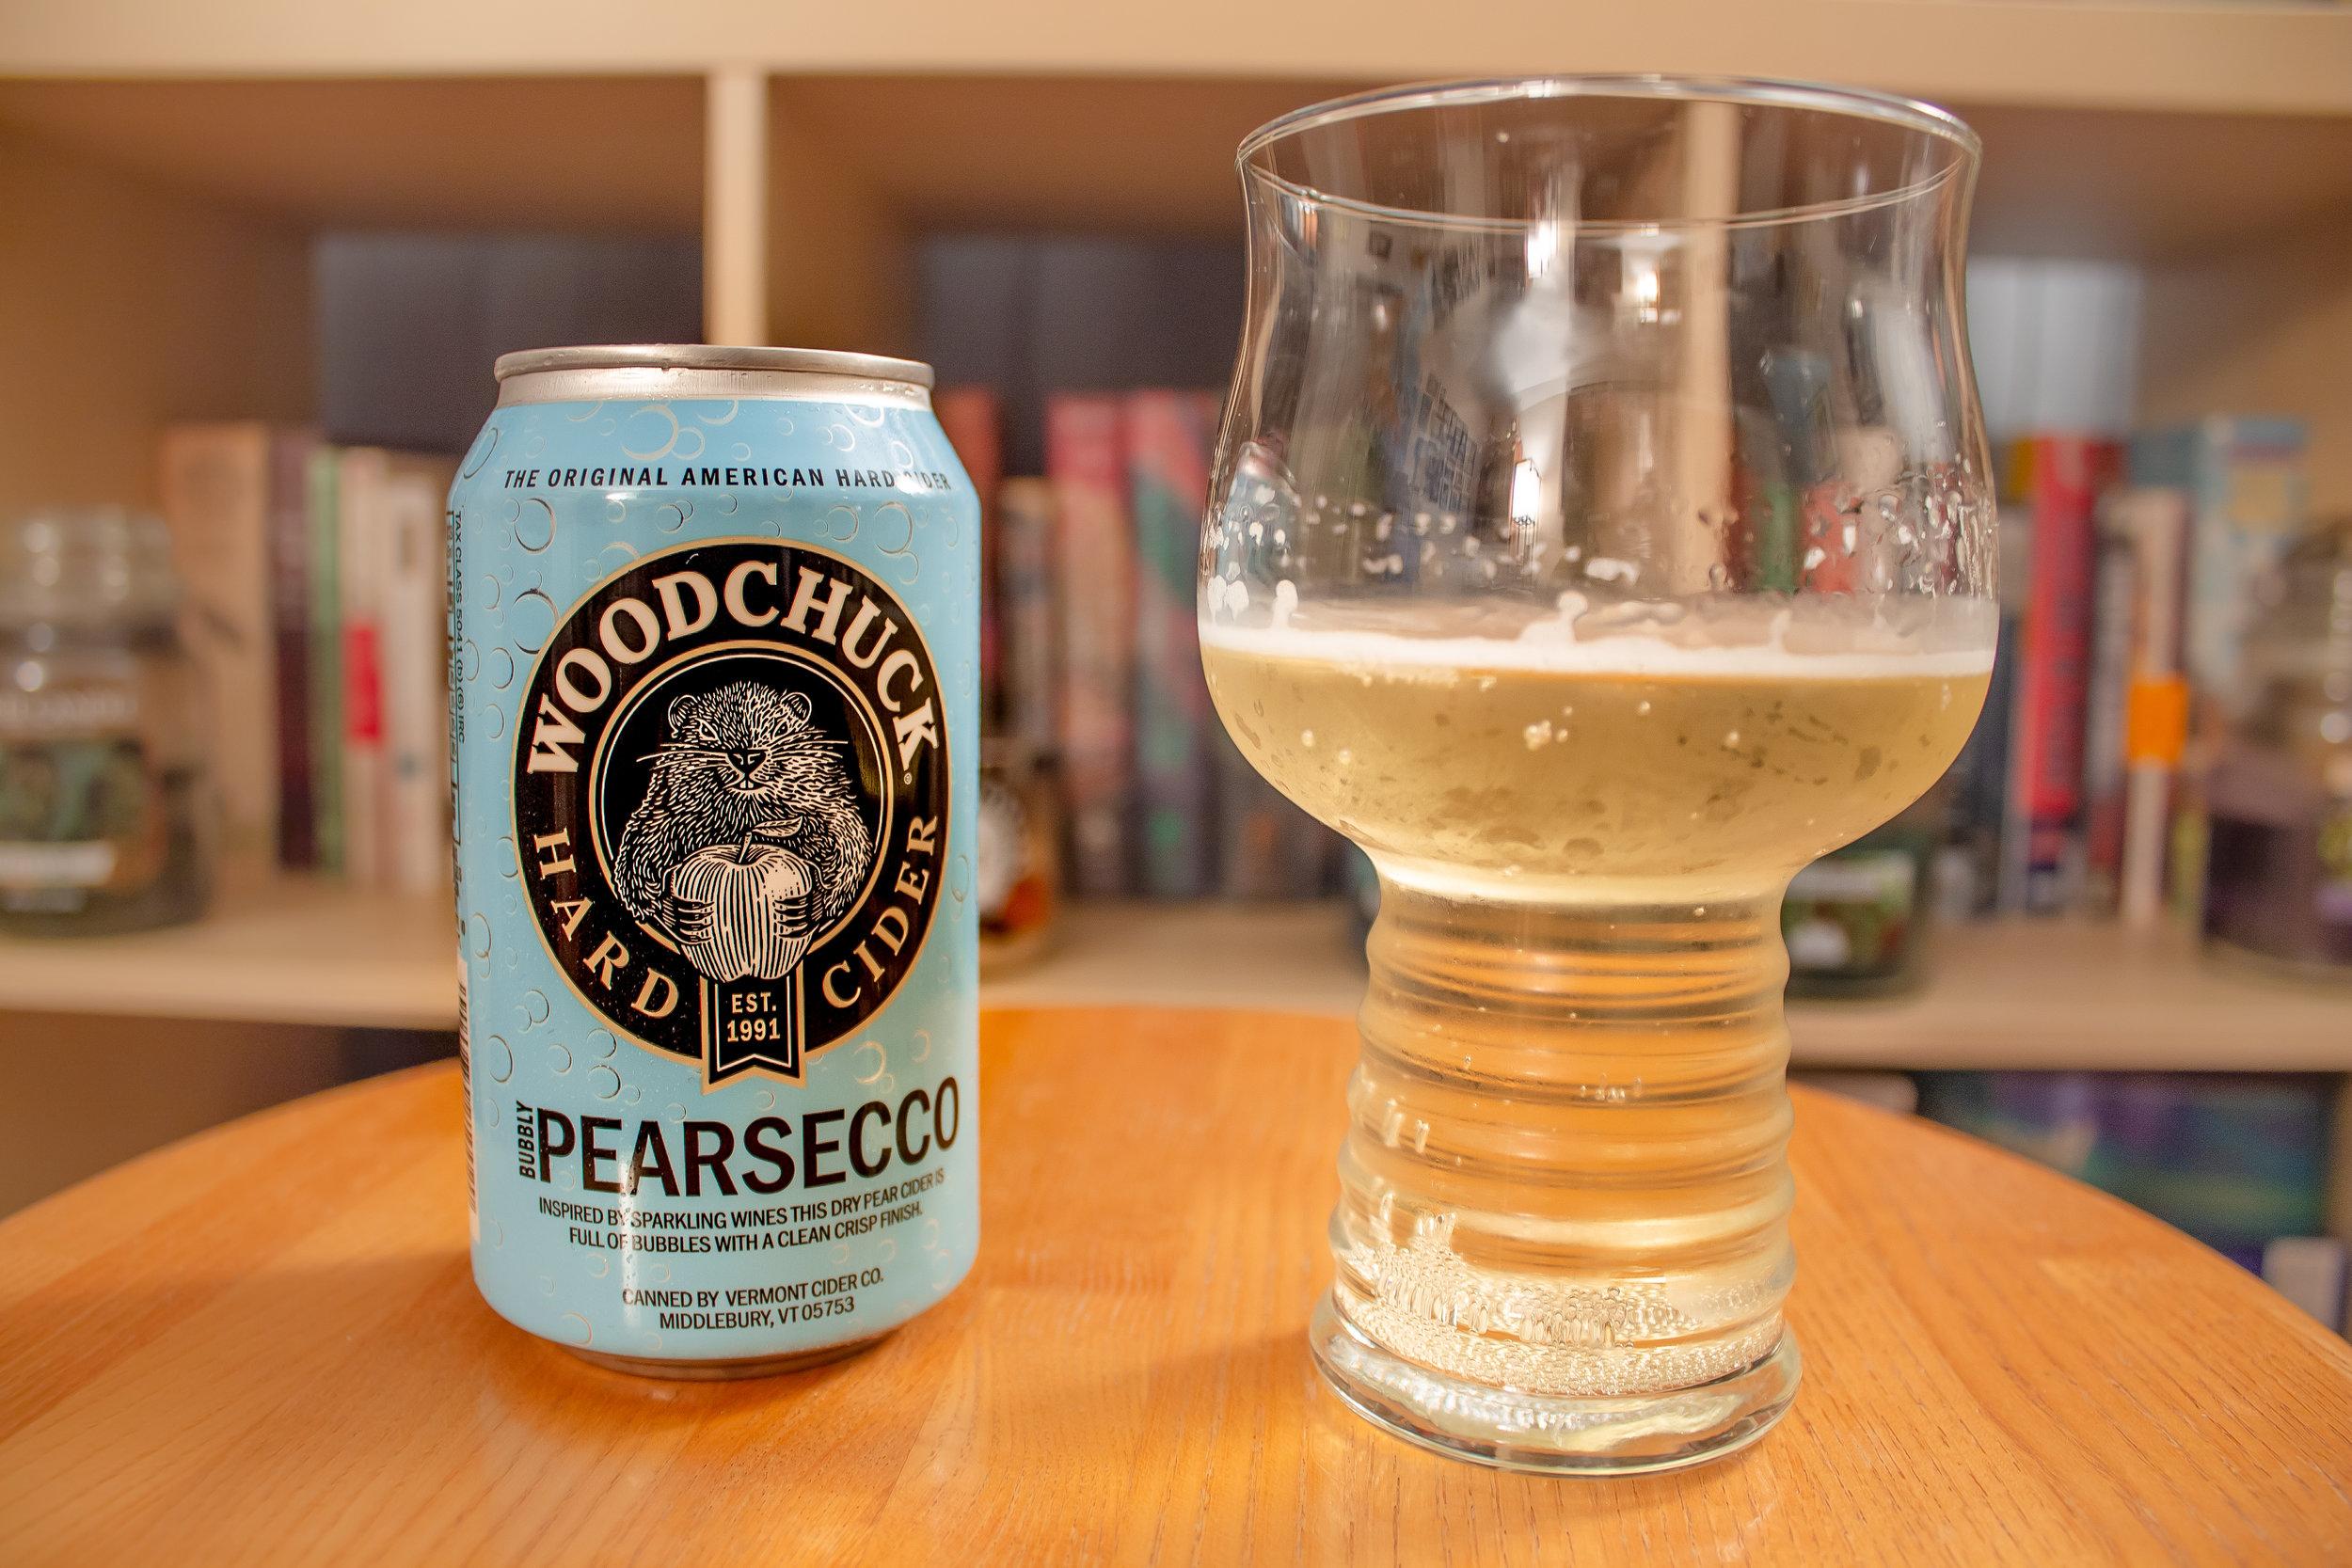 Woodchuck: Bubbly Pearsecco